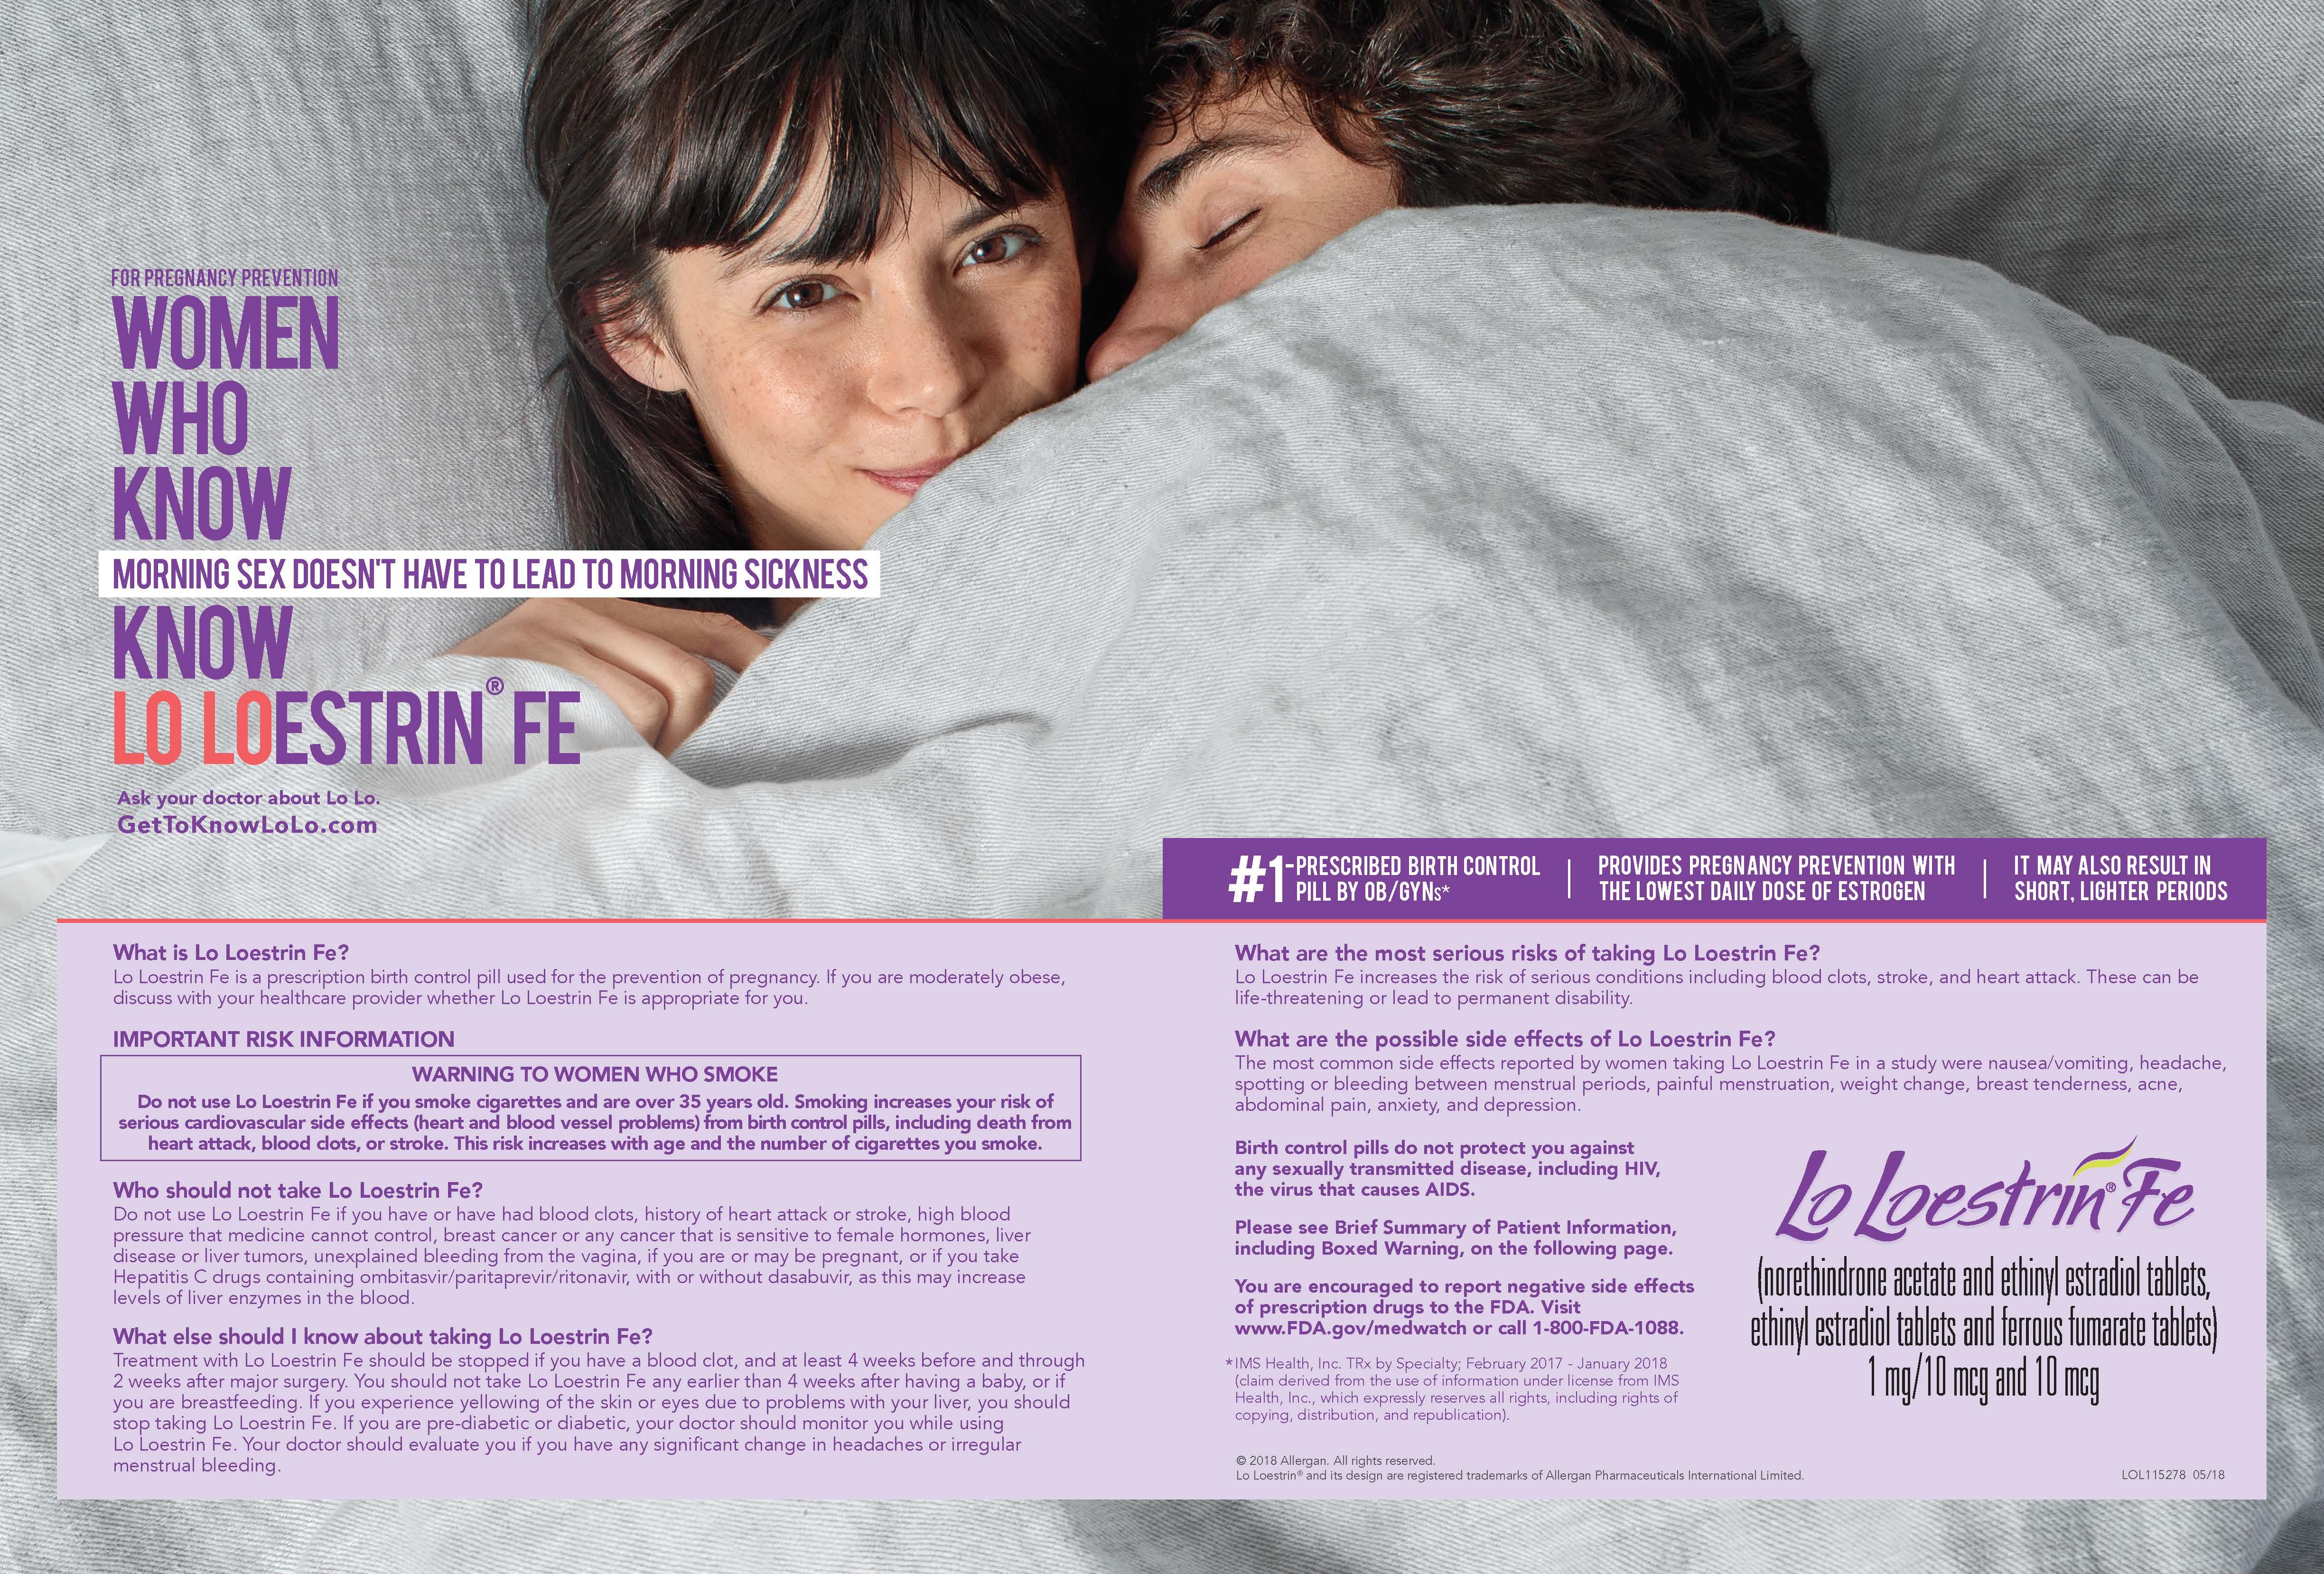 Got Lolo Allergan Hypes Ultralow Estrogen Birth Control In First Major Brand Push Fiercepharma